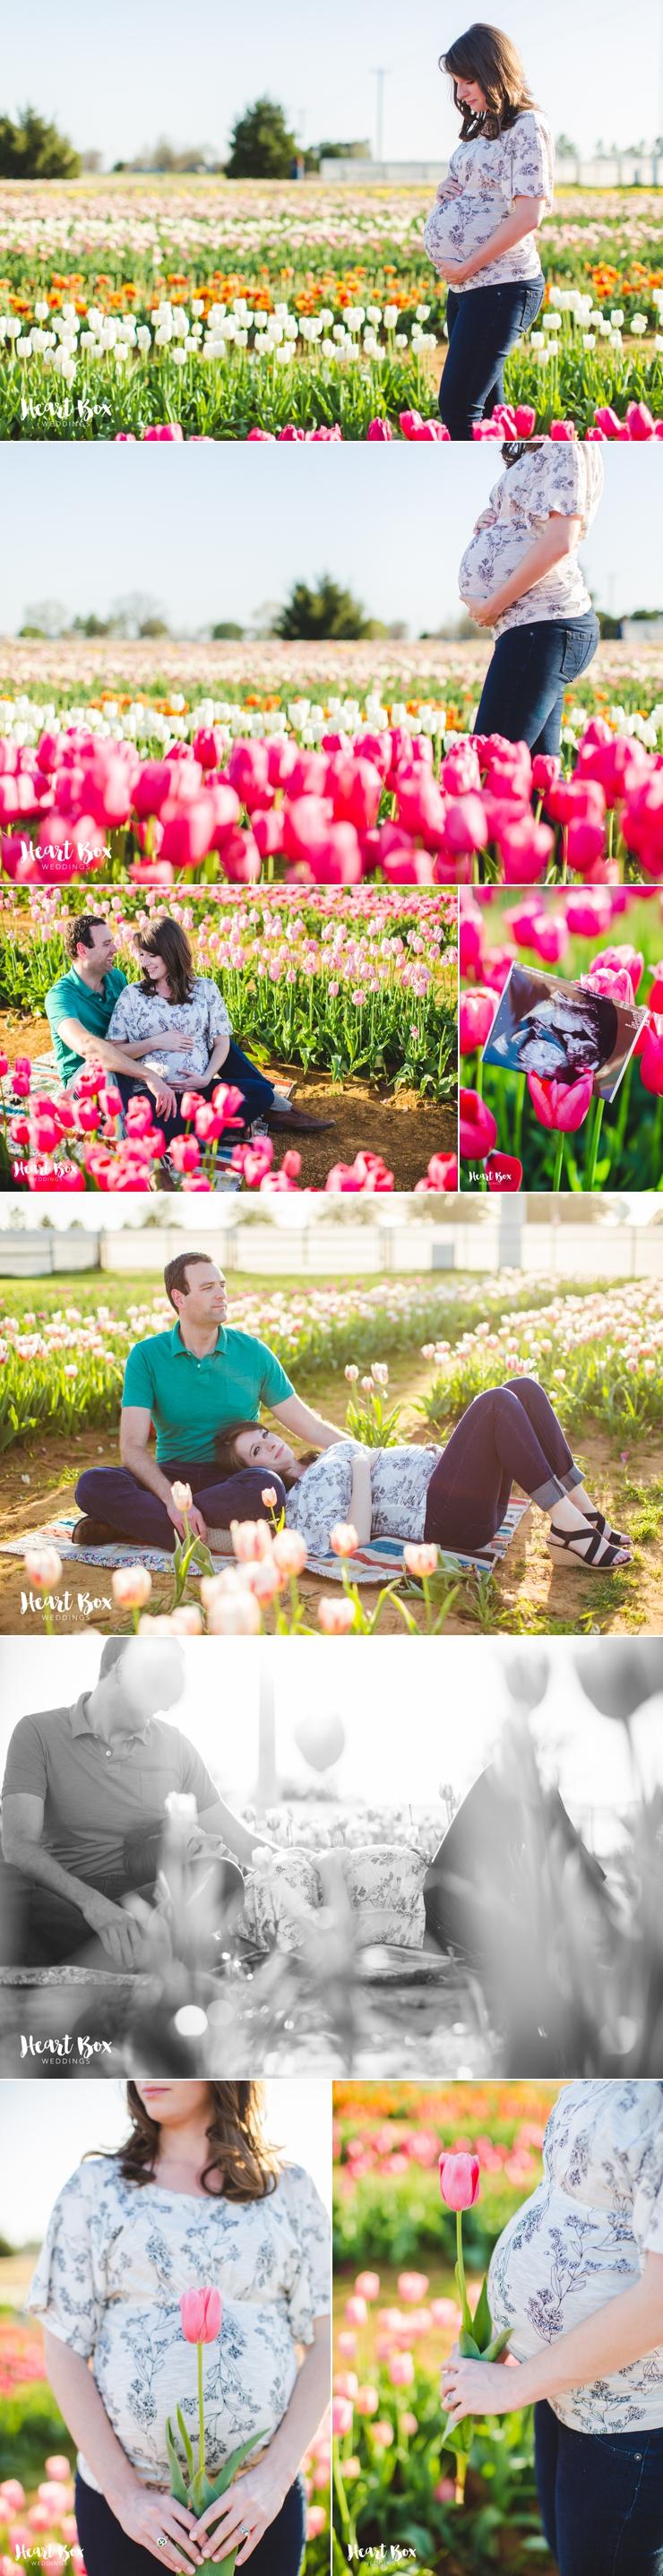 Jackson Maternity Blog Collages 1.jpg